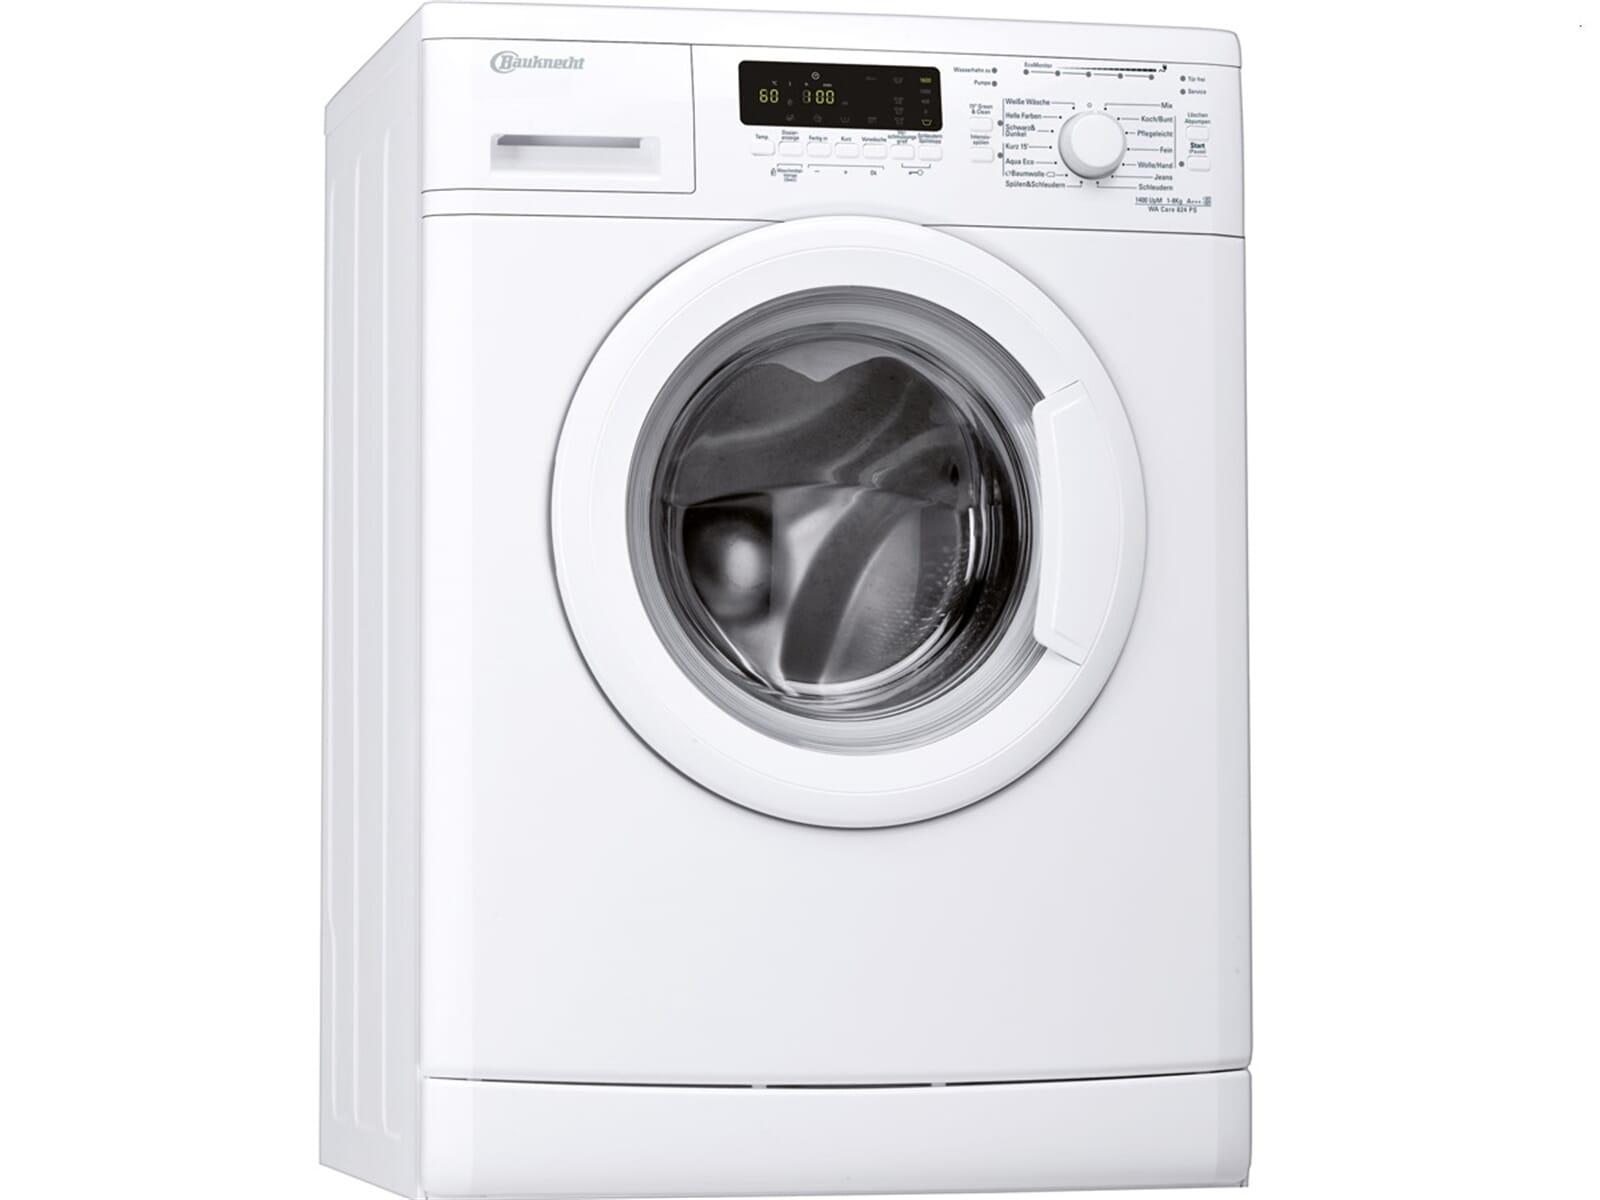 bauknecht wa care 824 ps waschmaschine wei. Black Bedroom Furniture Sets. Home Design Ideas